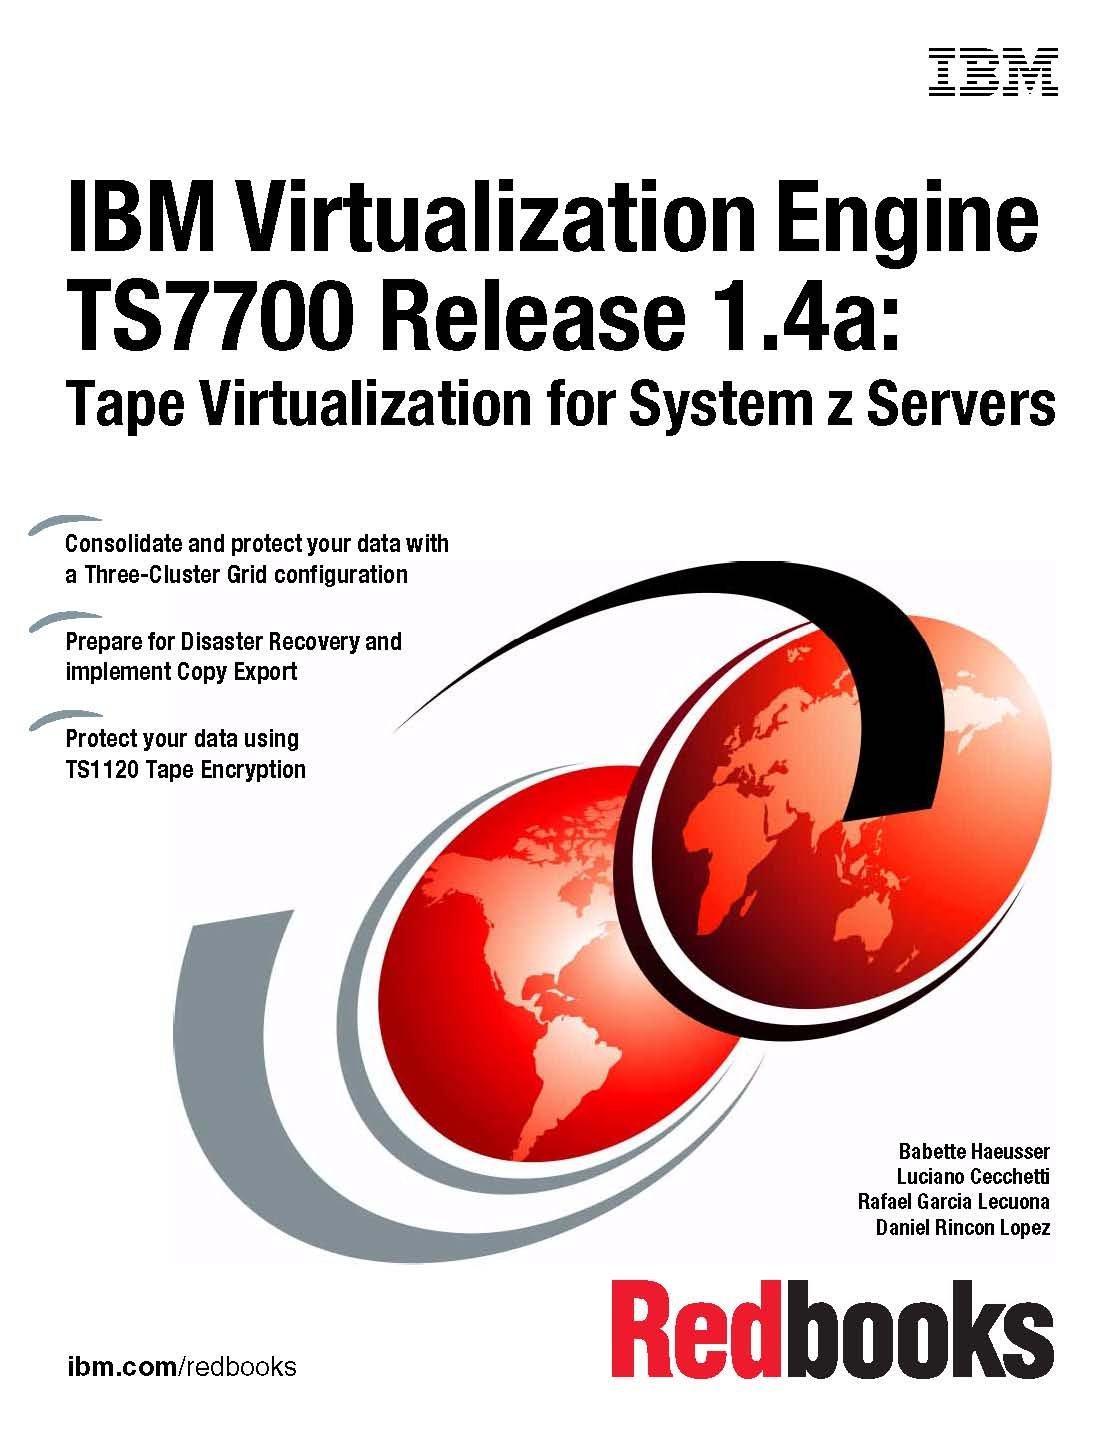 Download IBM Virtualization Engine Ts7700 Release 1.4a: Tape Virtualization for System Z Servers PDF